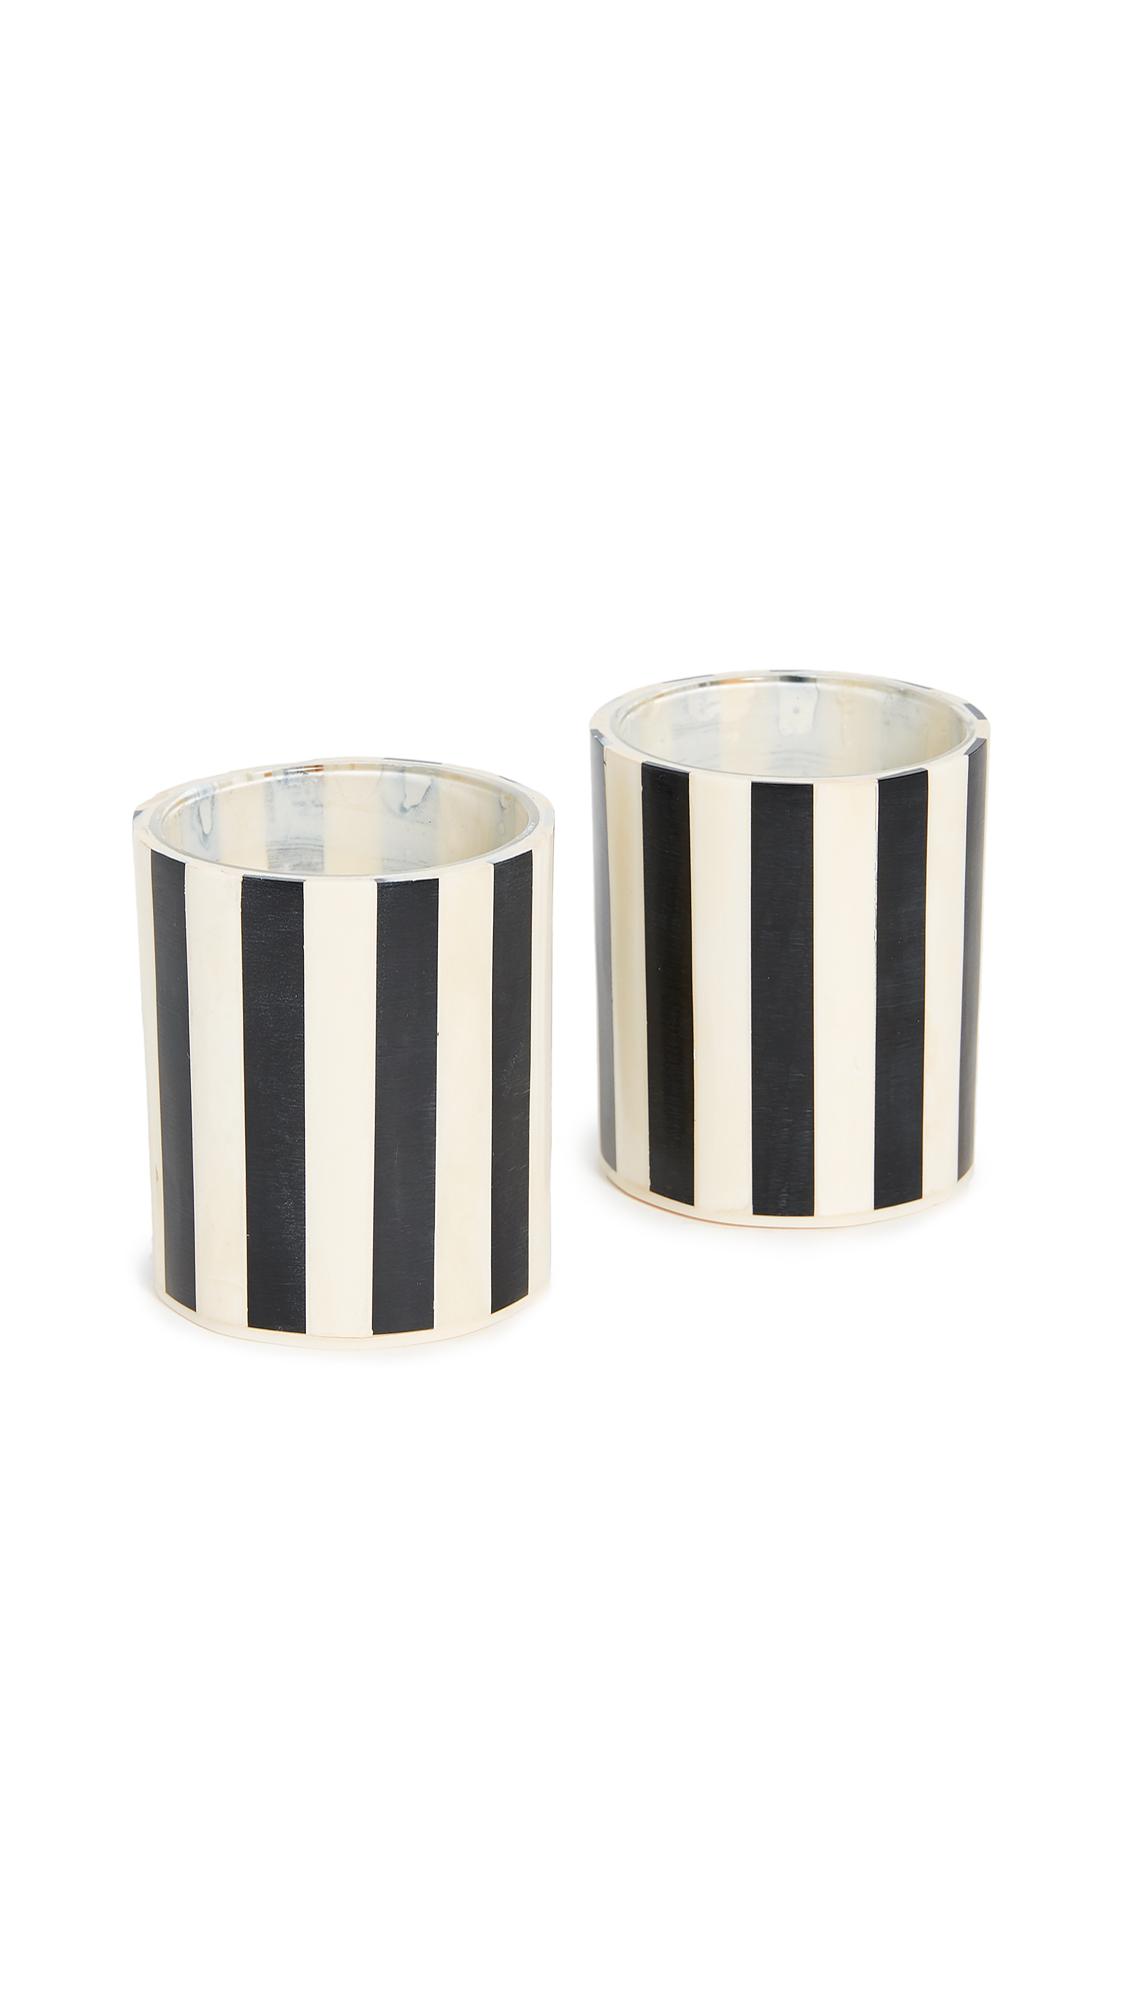 Lele Sadoughi Striped Votive Candle Holder Set - Black/White